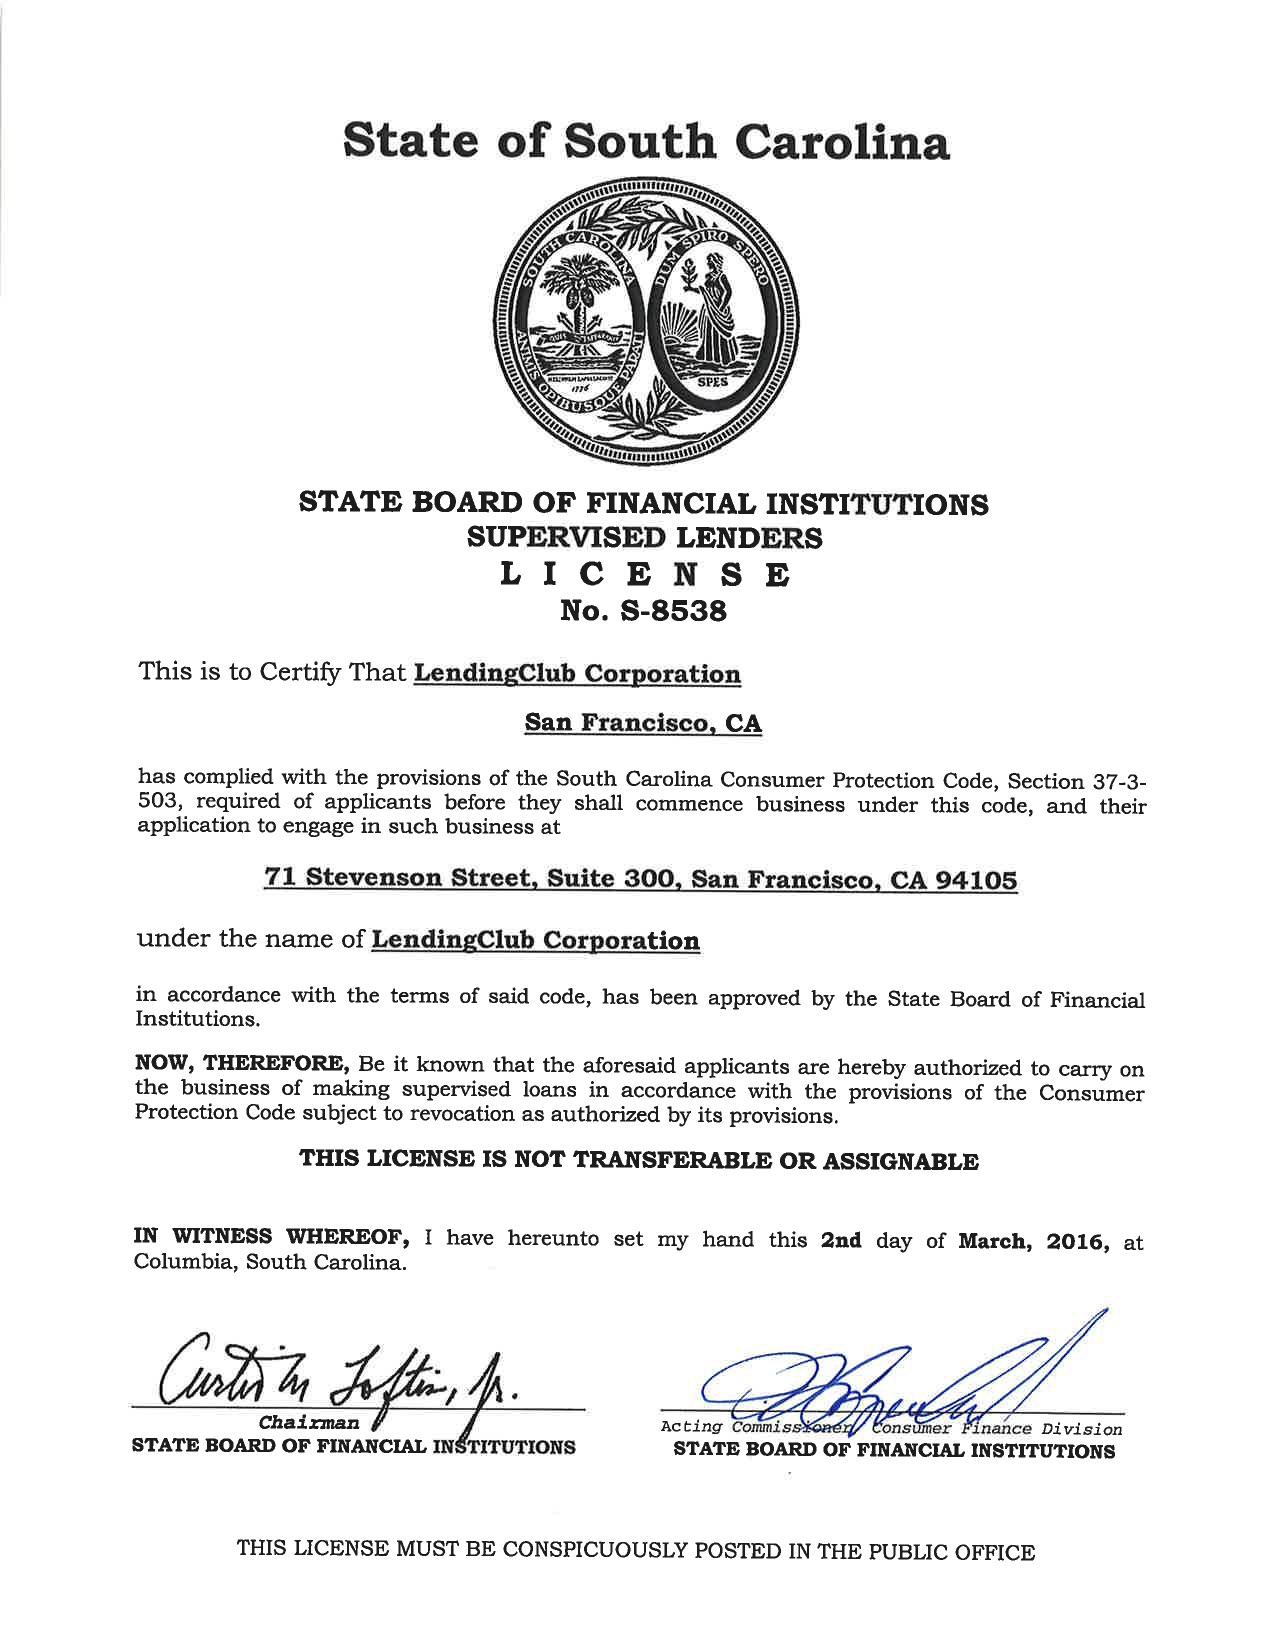 south-carolina-supervised-lender-licenses-s8538